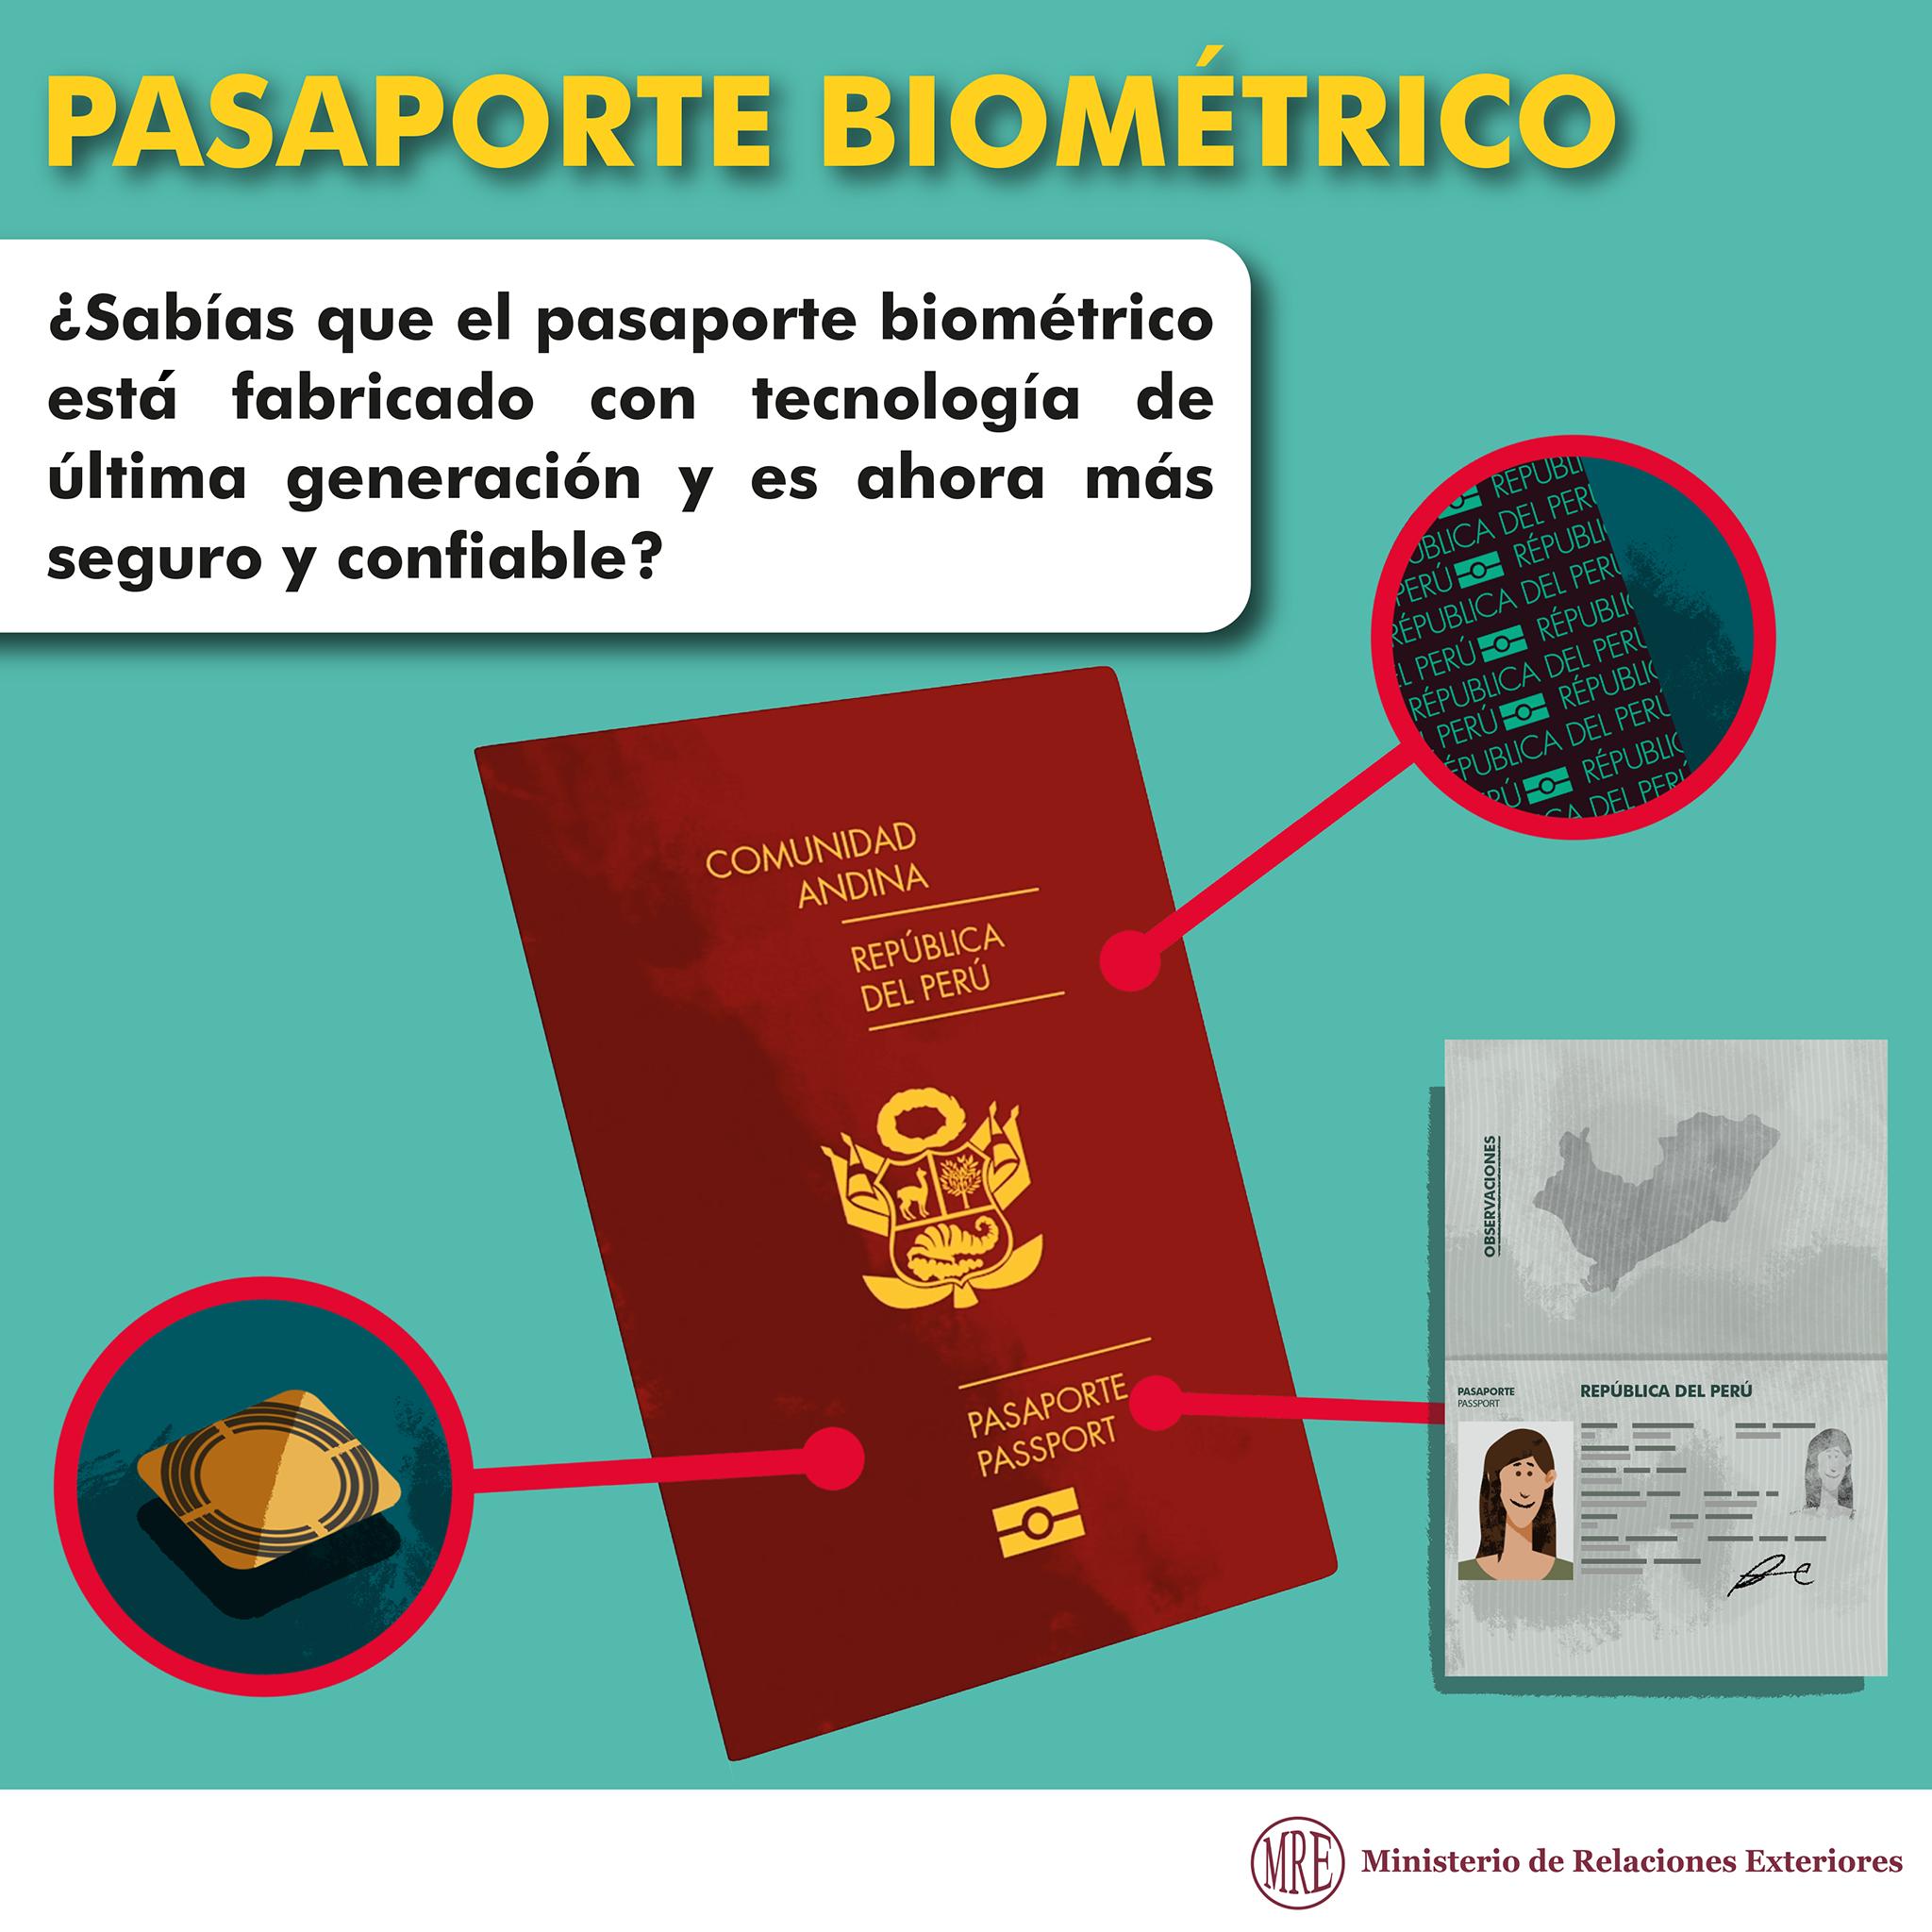 Pasaporte biom trico 2 png